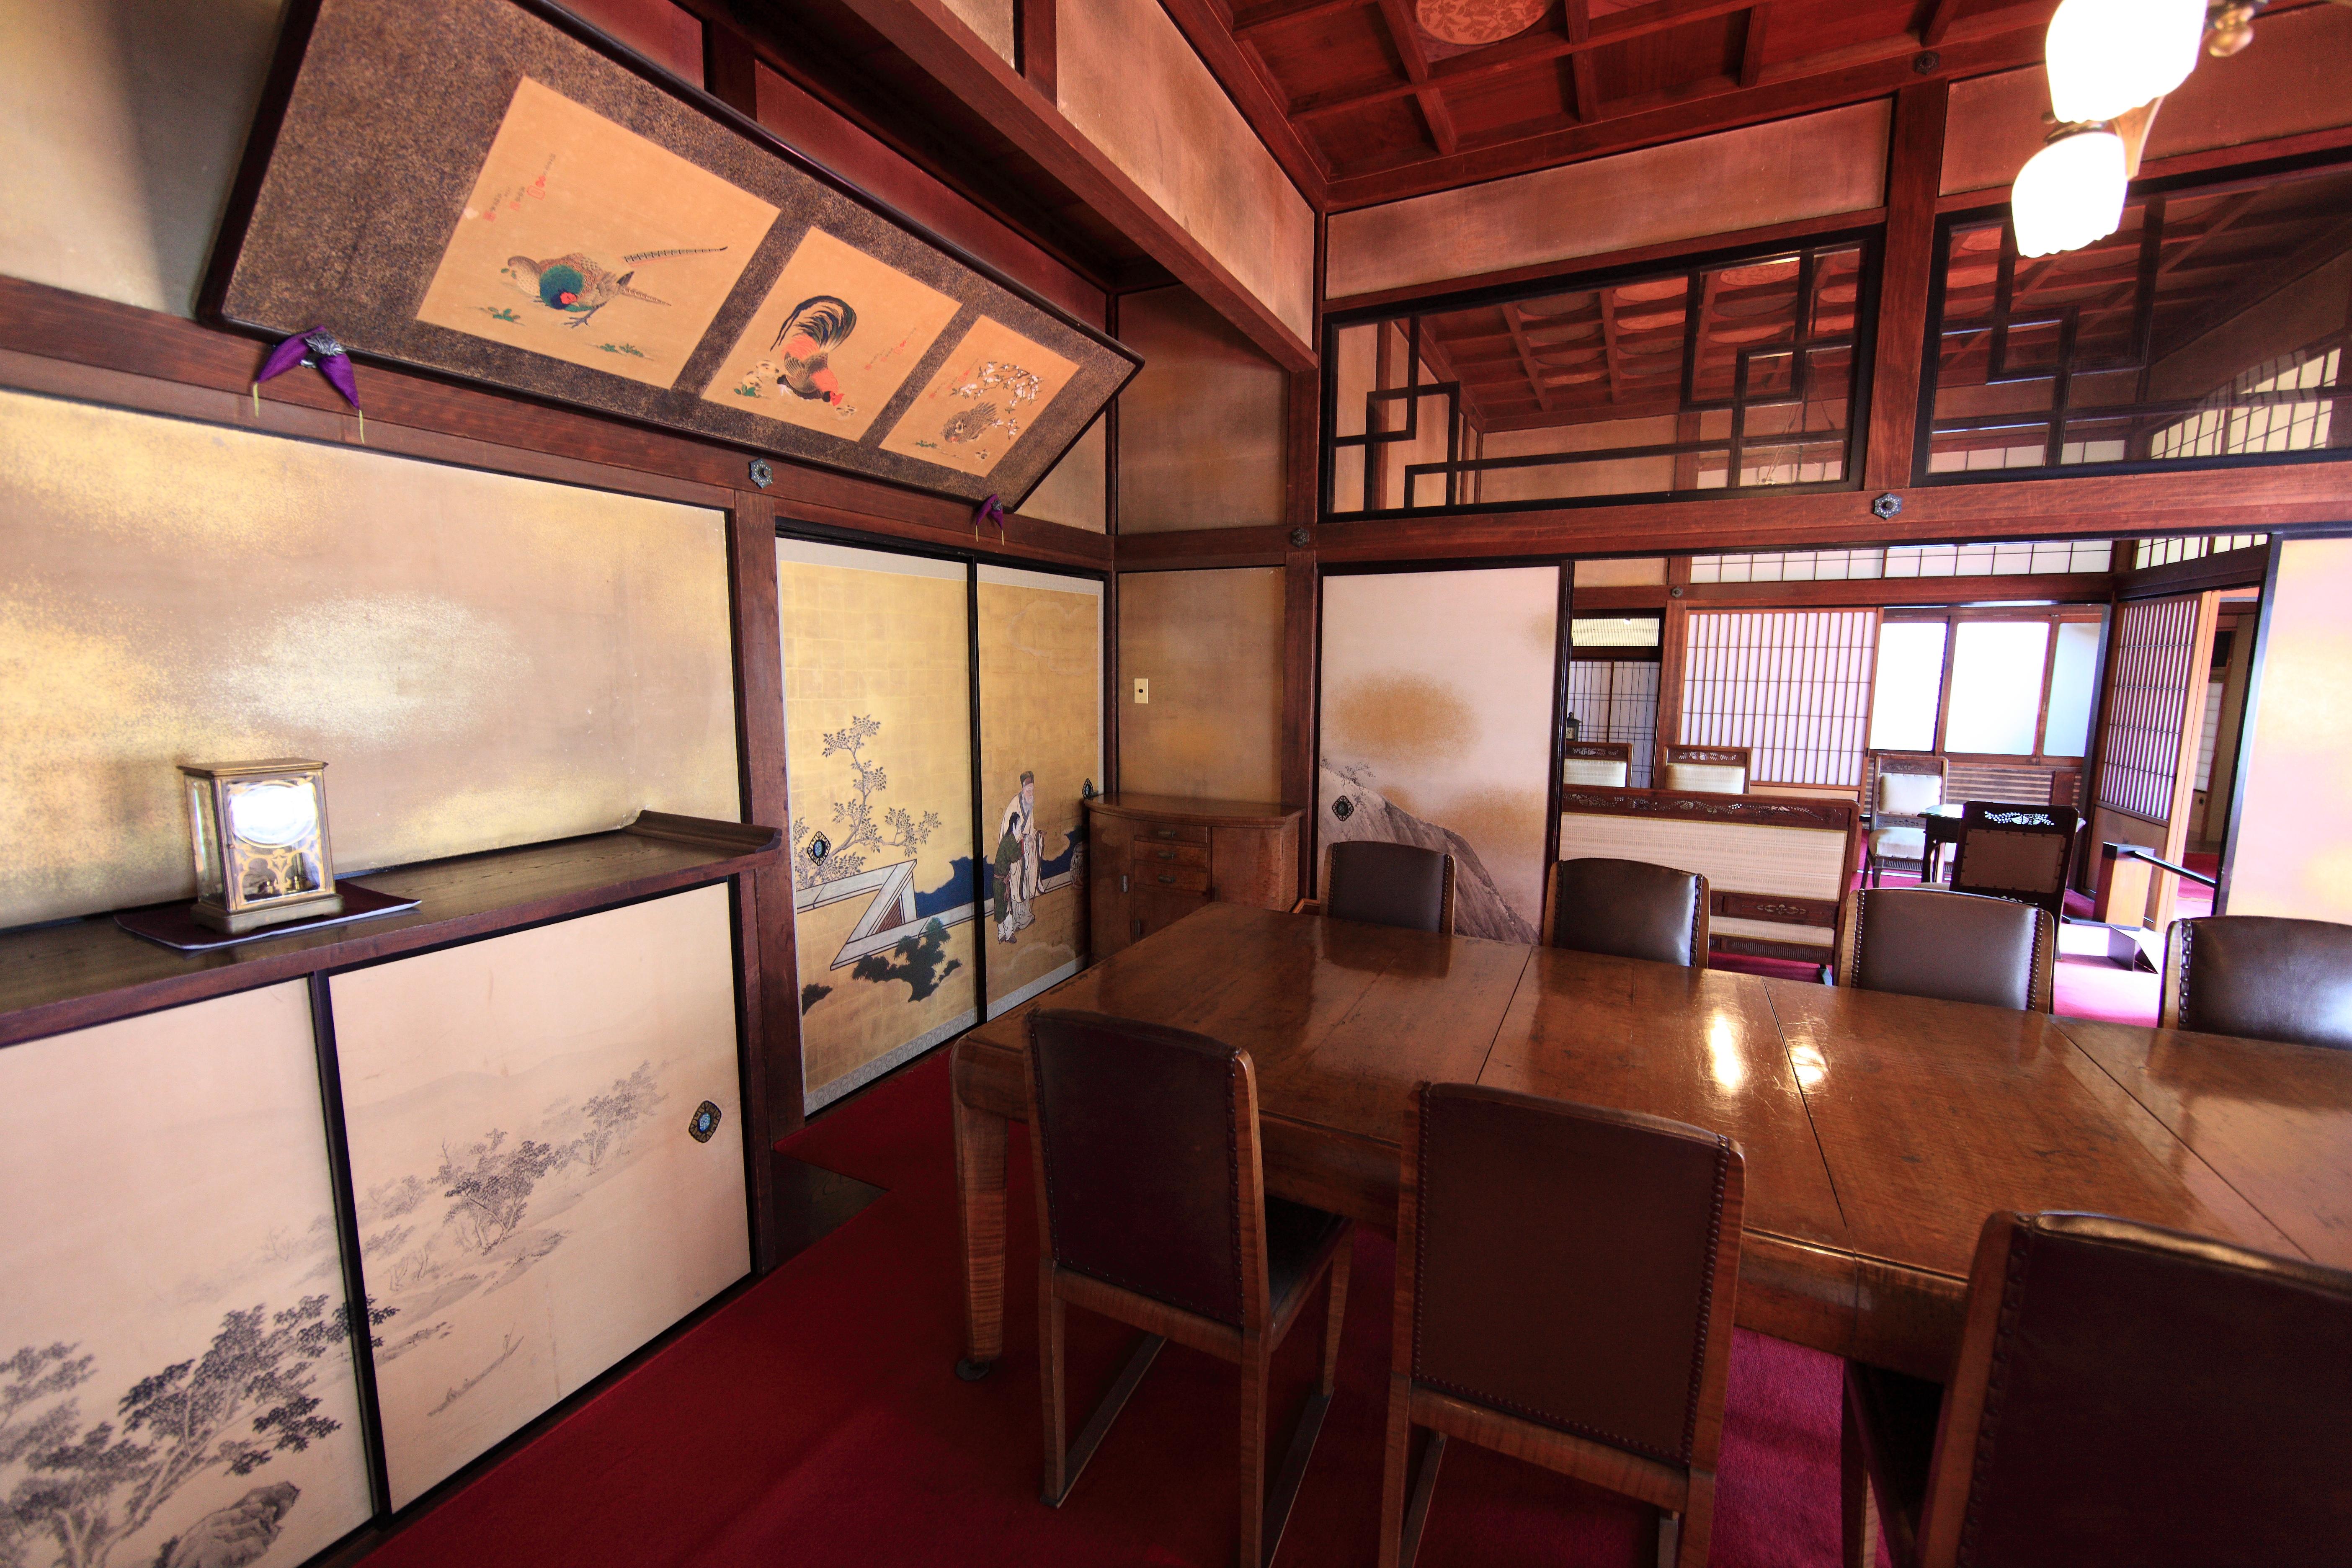 Gambar Arsitektur Rumah Pedalaman Restoran Tua Tinggi Kuno